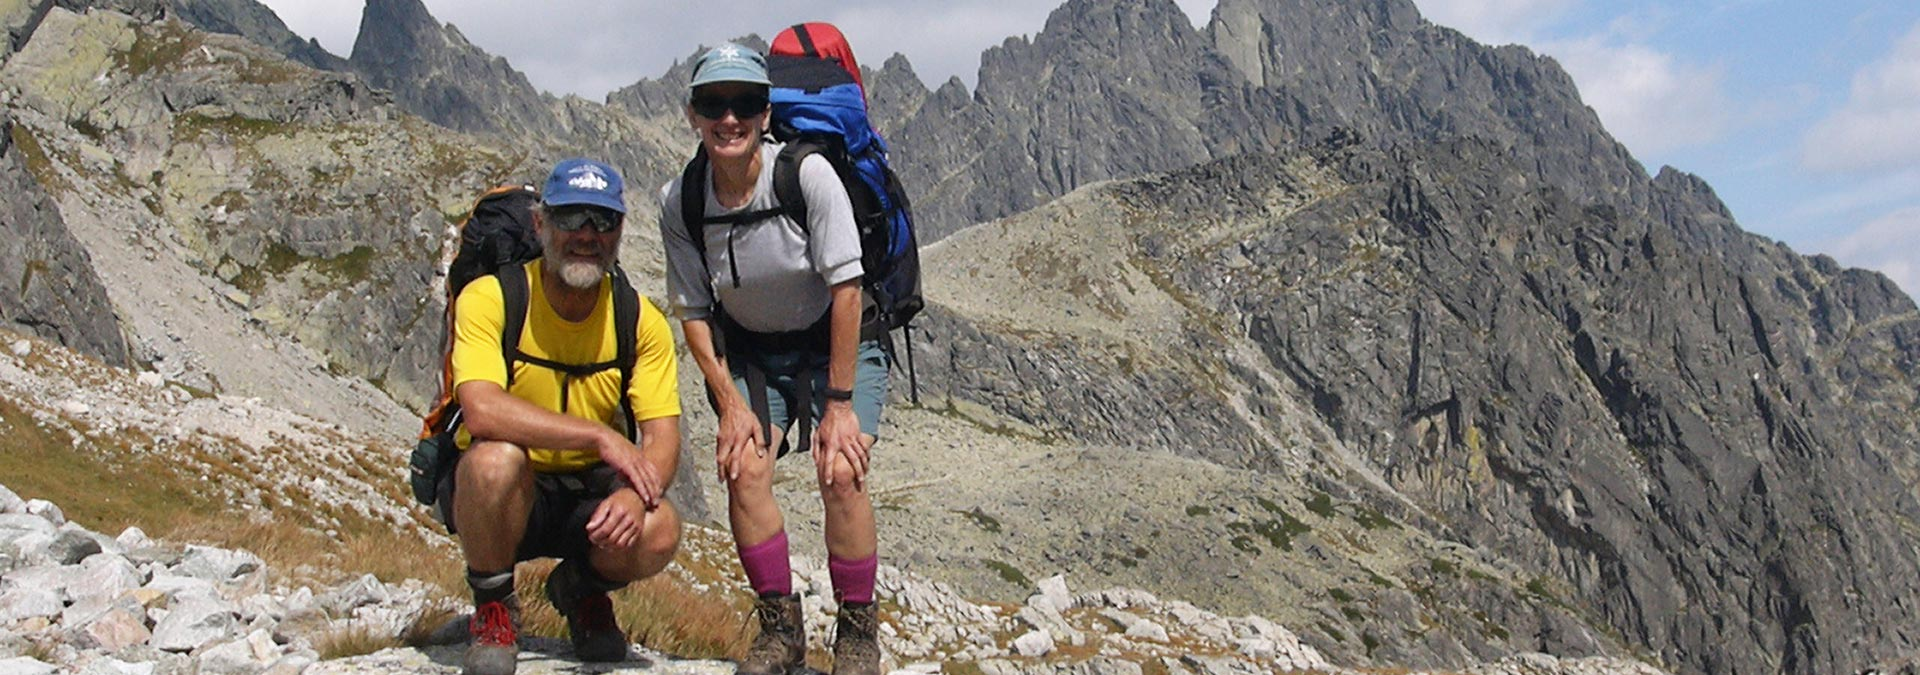 The High Tatras - Self-guided Tour, Slovakia Travel, Location